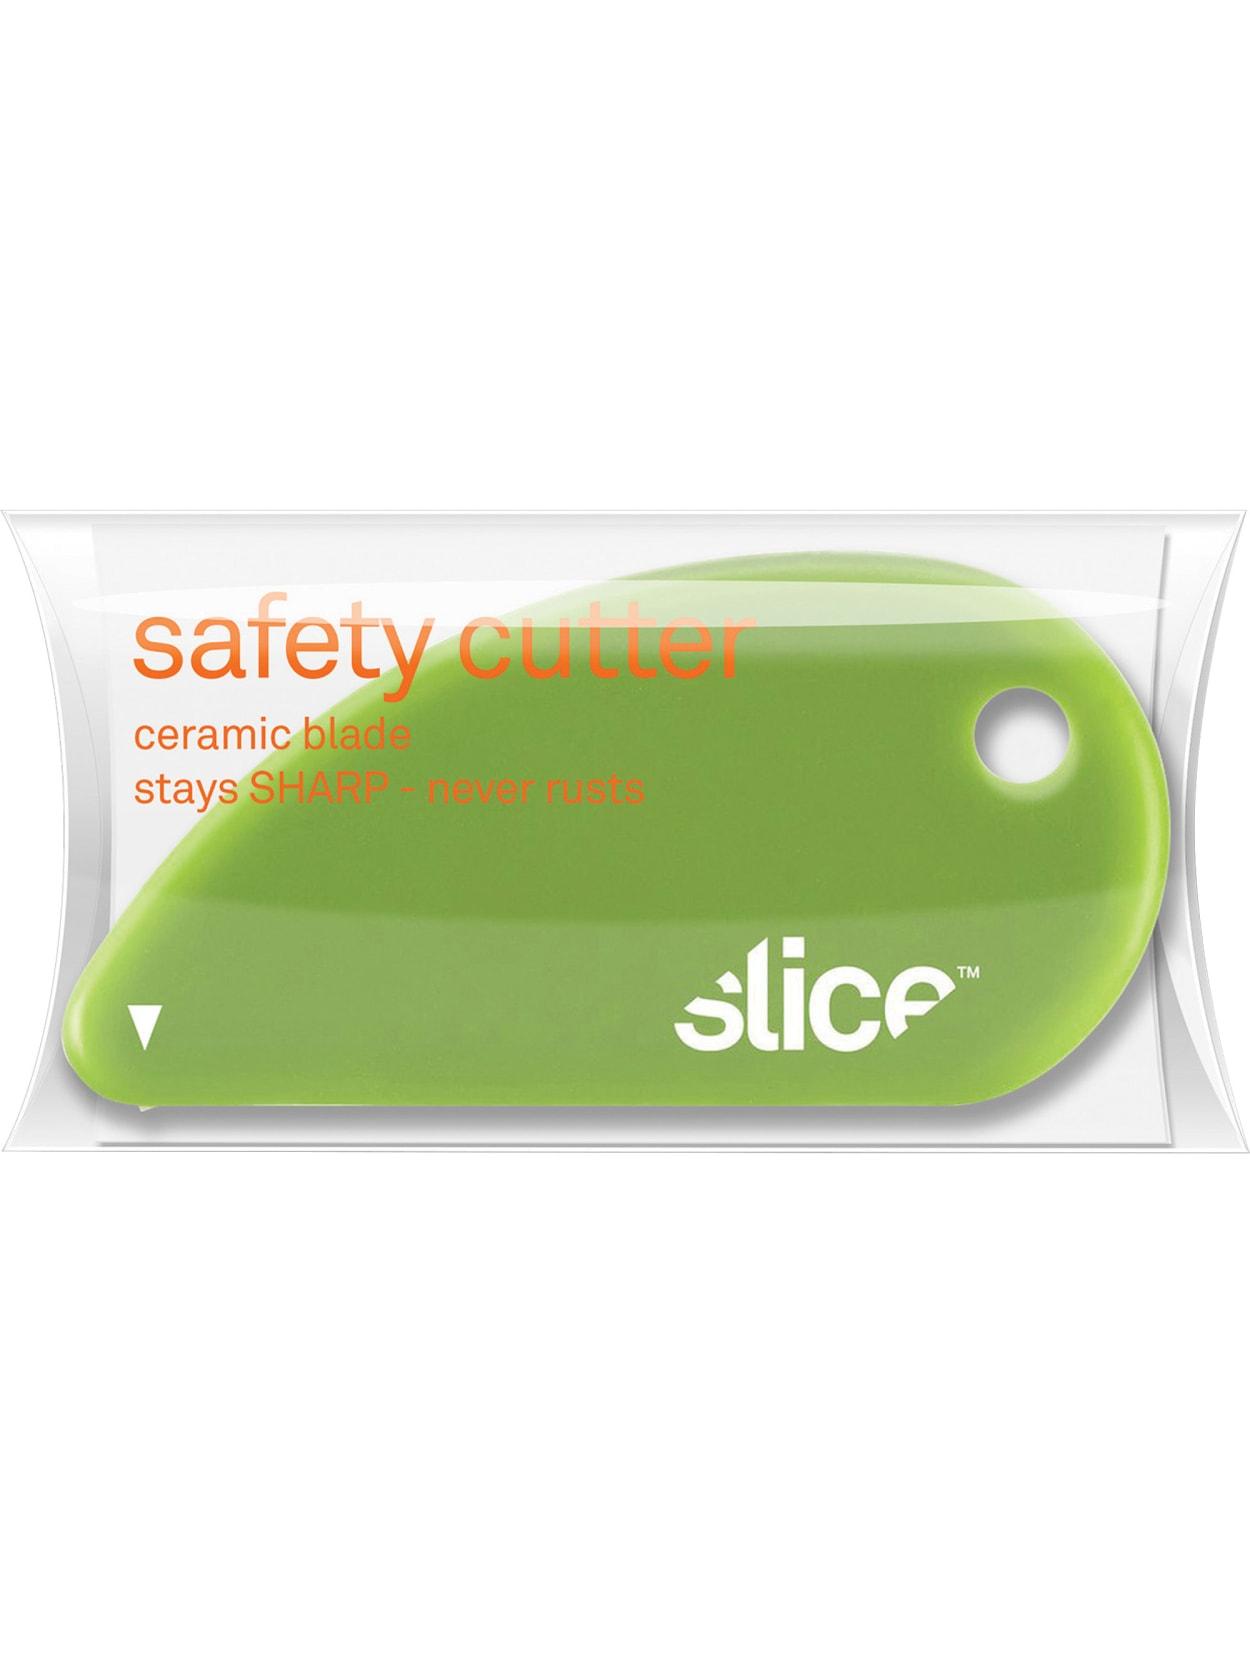 CERAMIC SAFETY CRAFT CUTTER